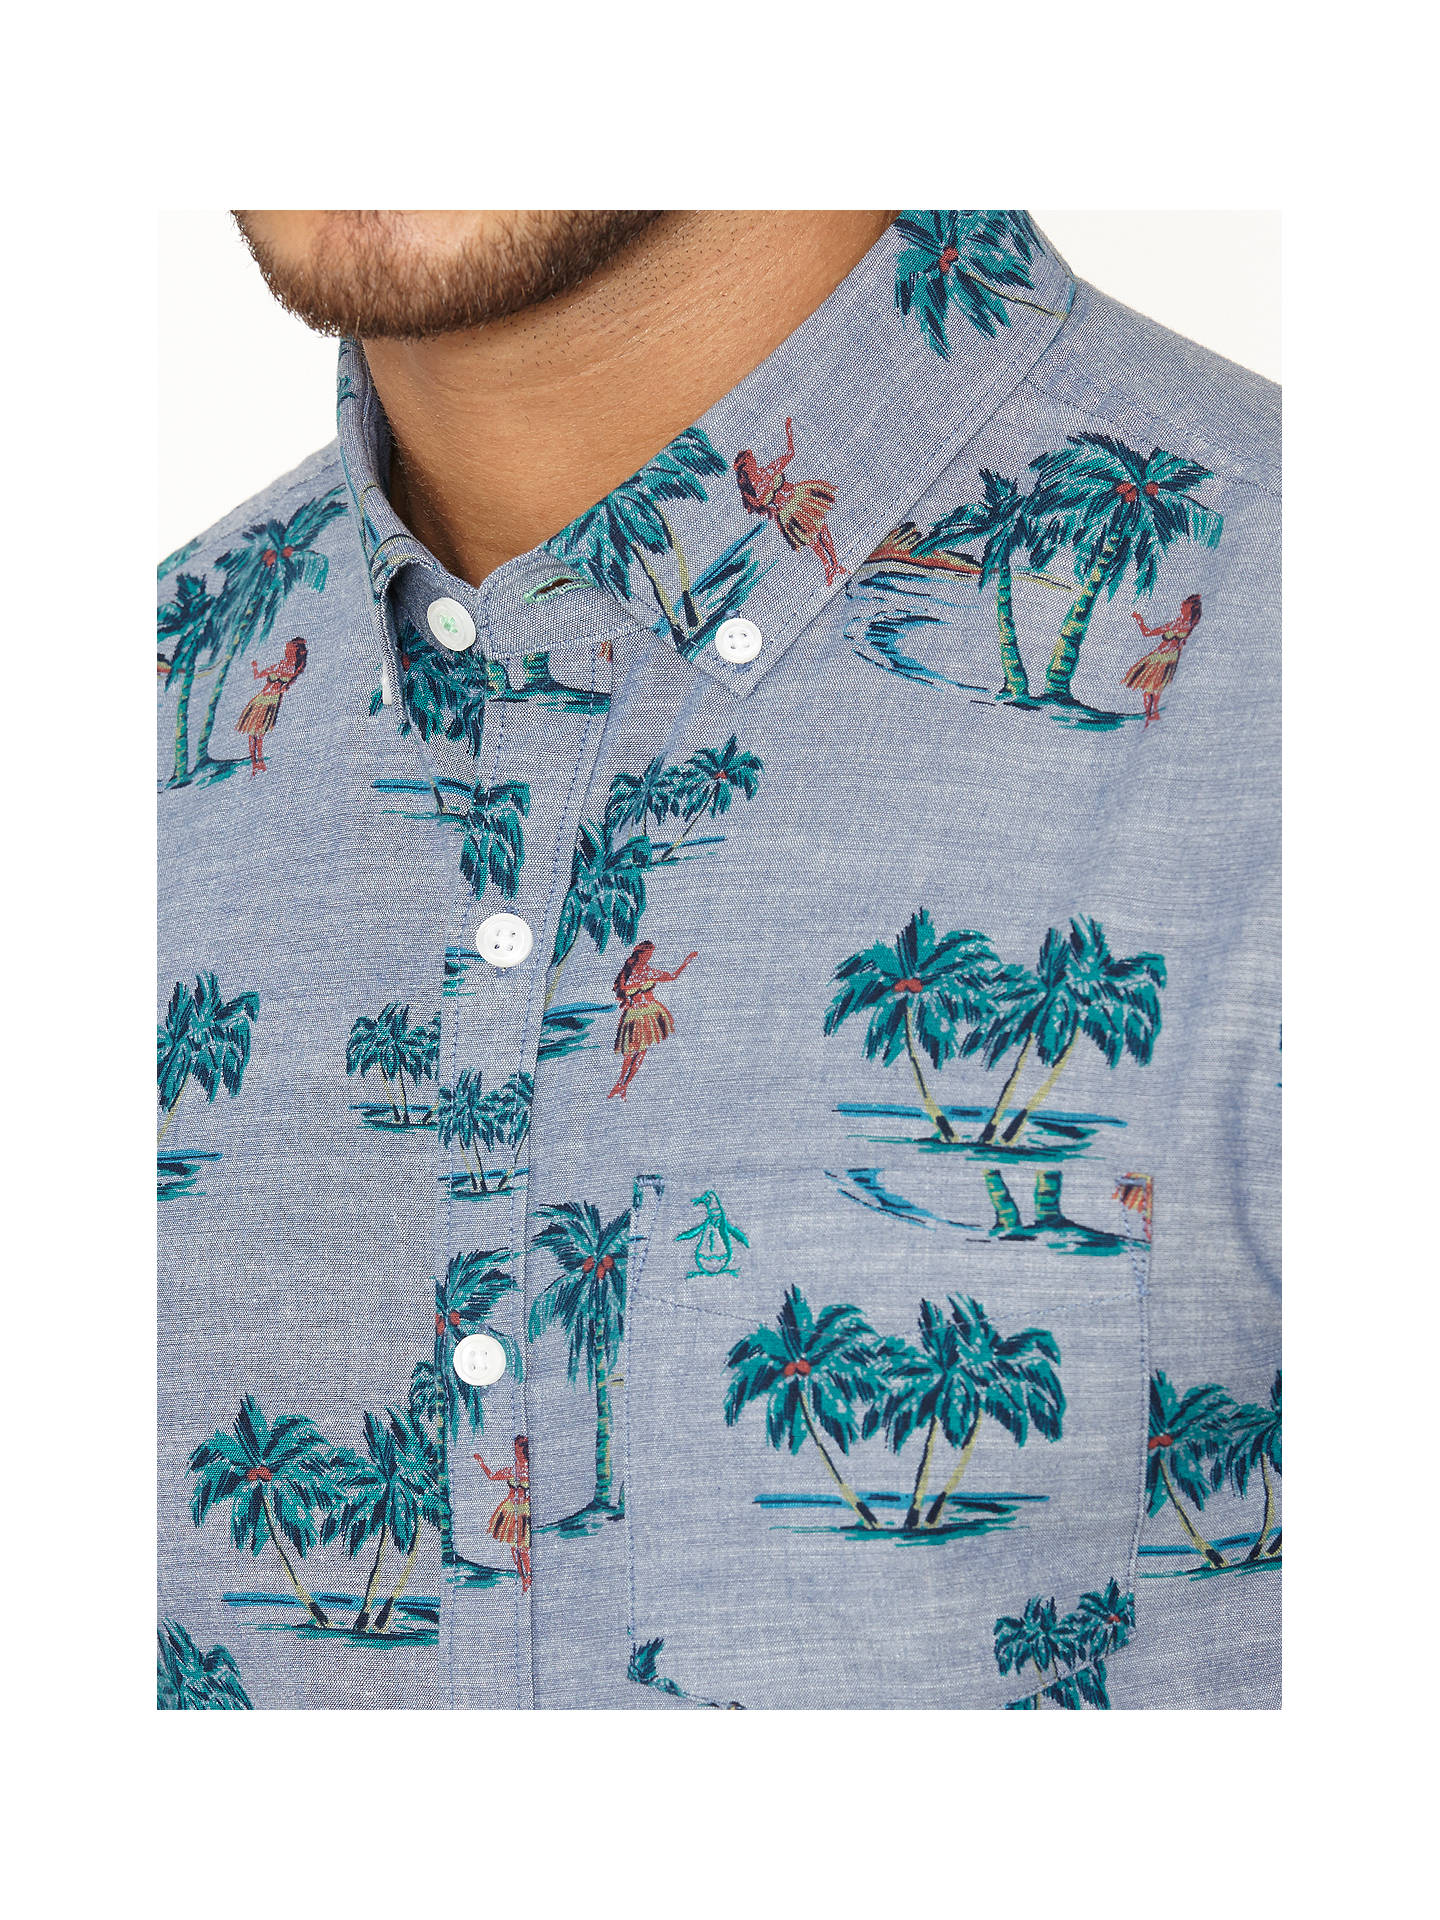 bd5d1e6d ... Buy Original Penguin Tropical Print Short Sleeve Shirt, Dress Blue, M  Online at johnlewis